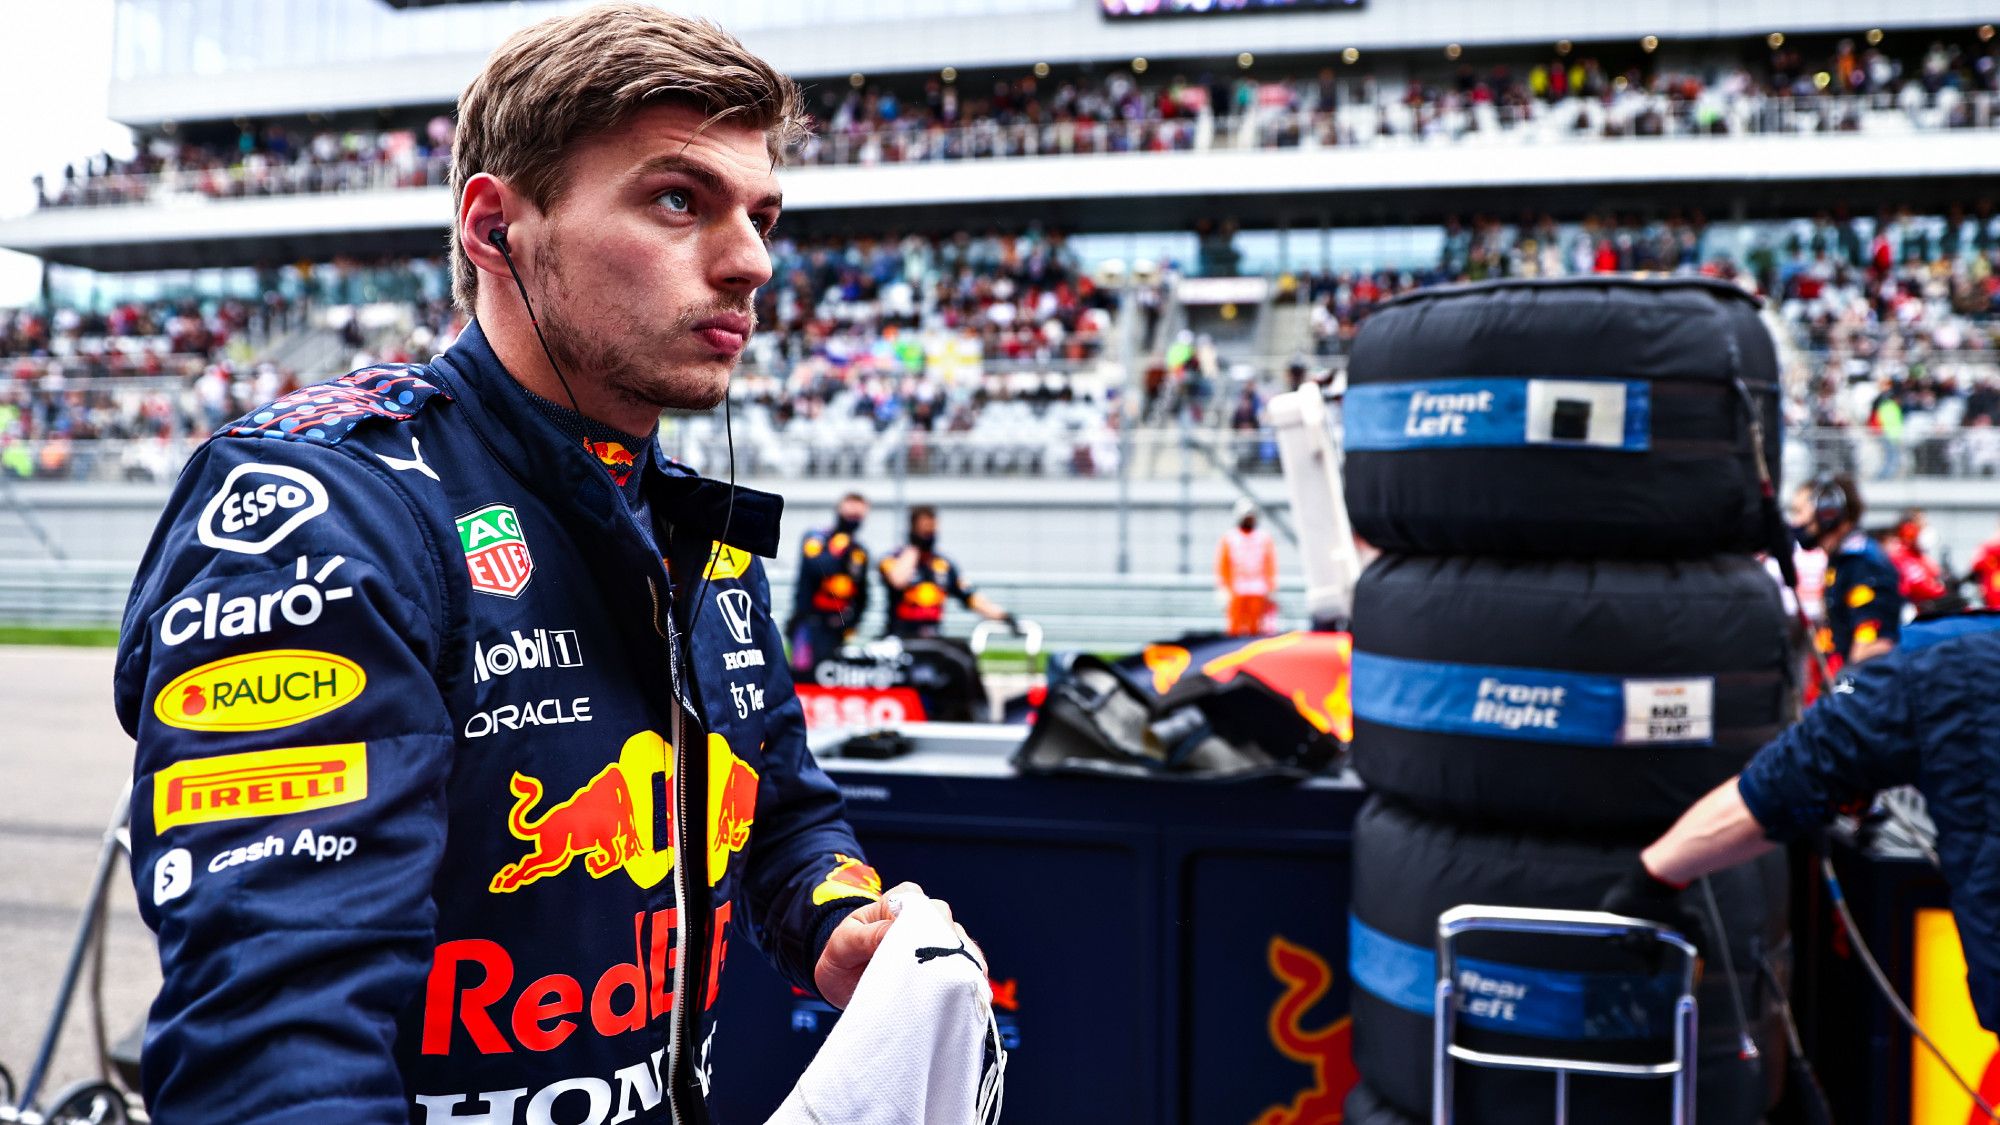 Max Verstappen, 2021 Russian GP